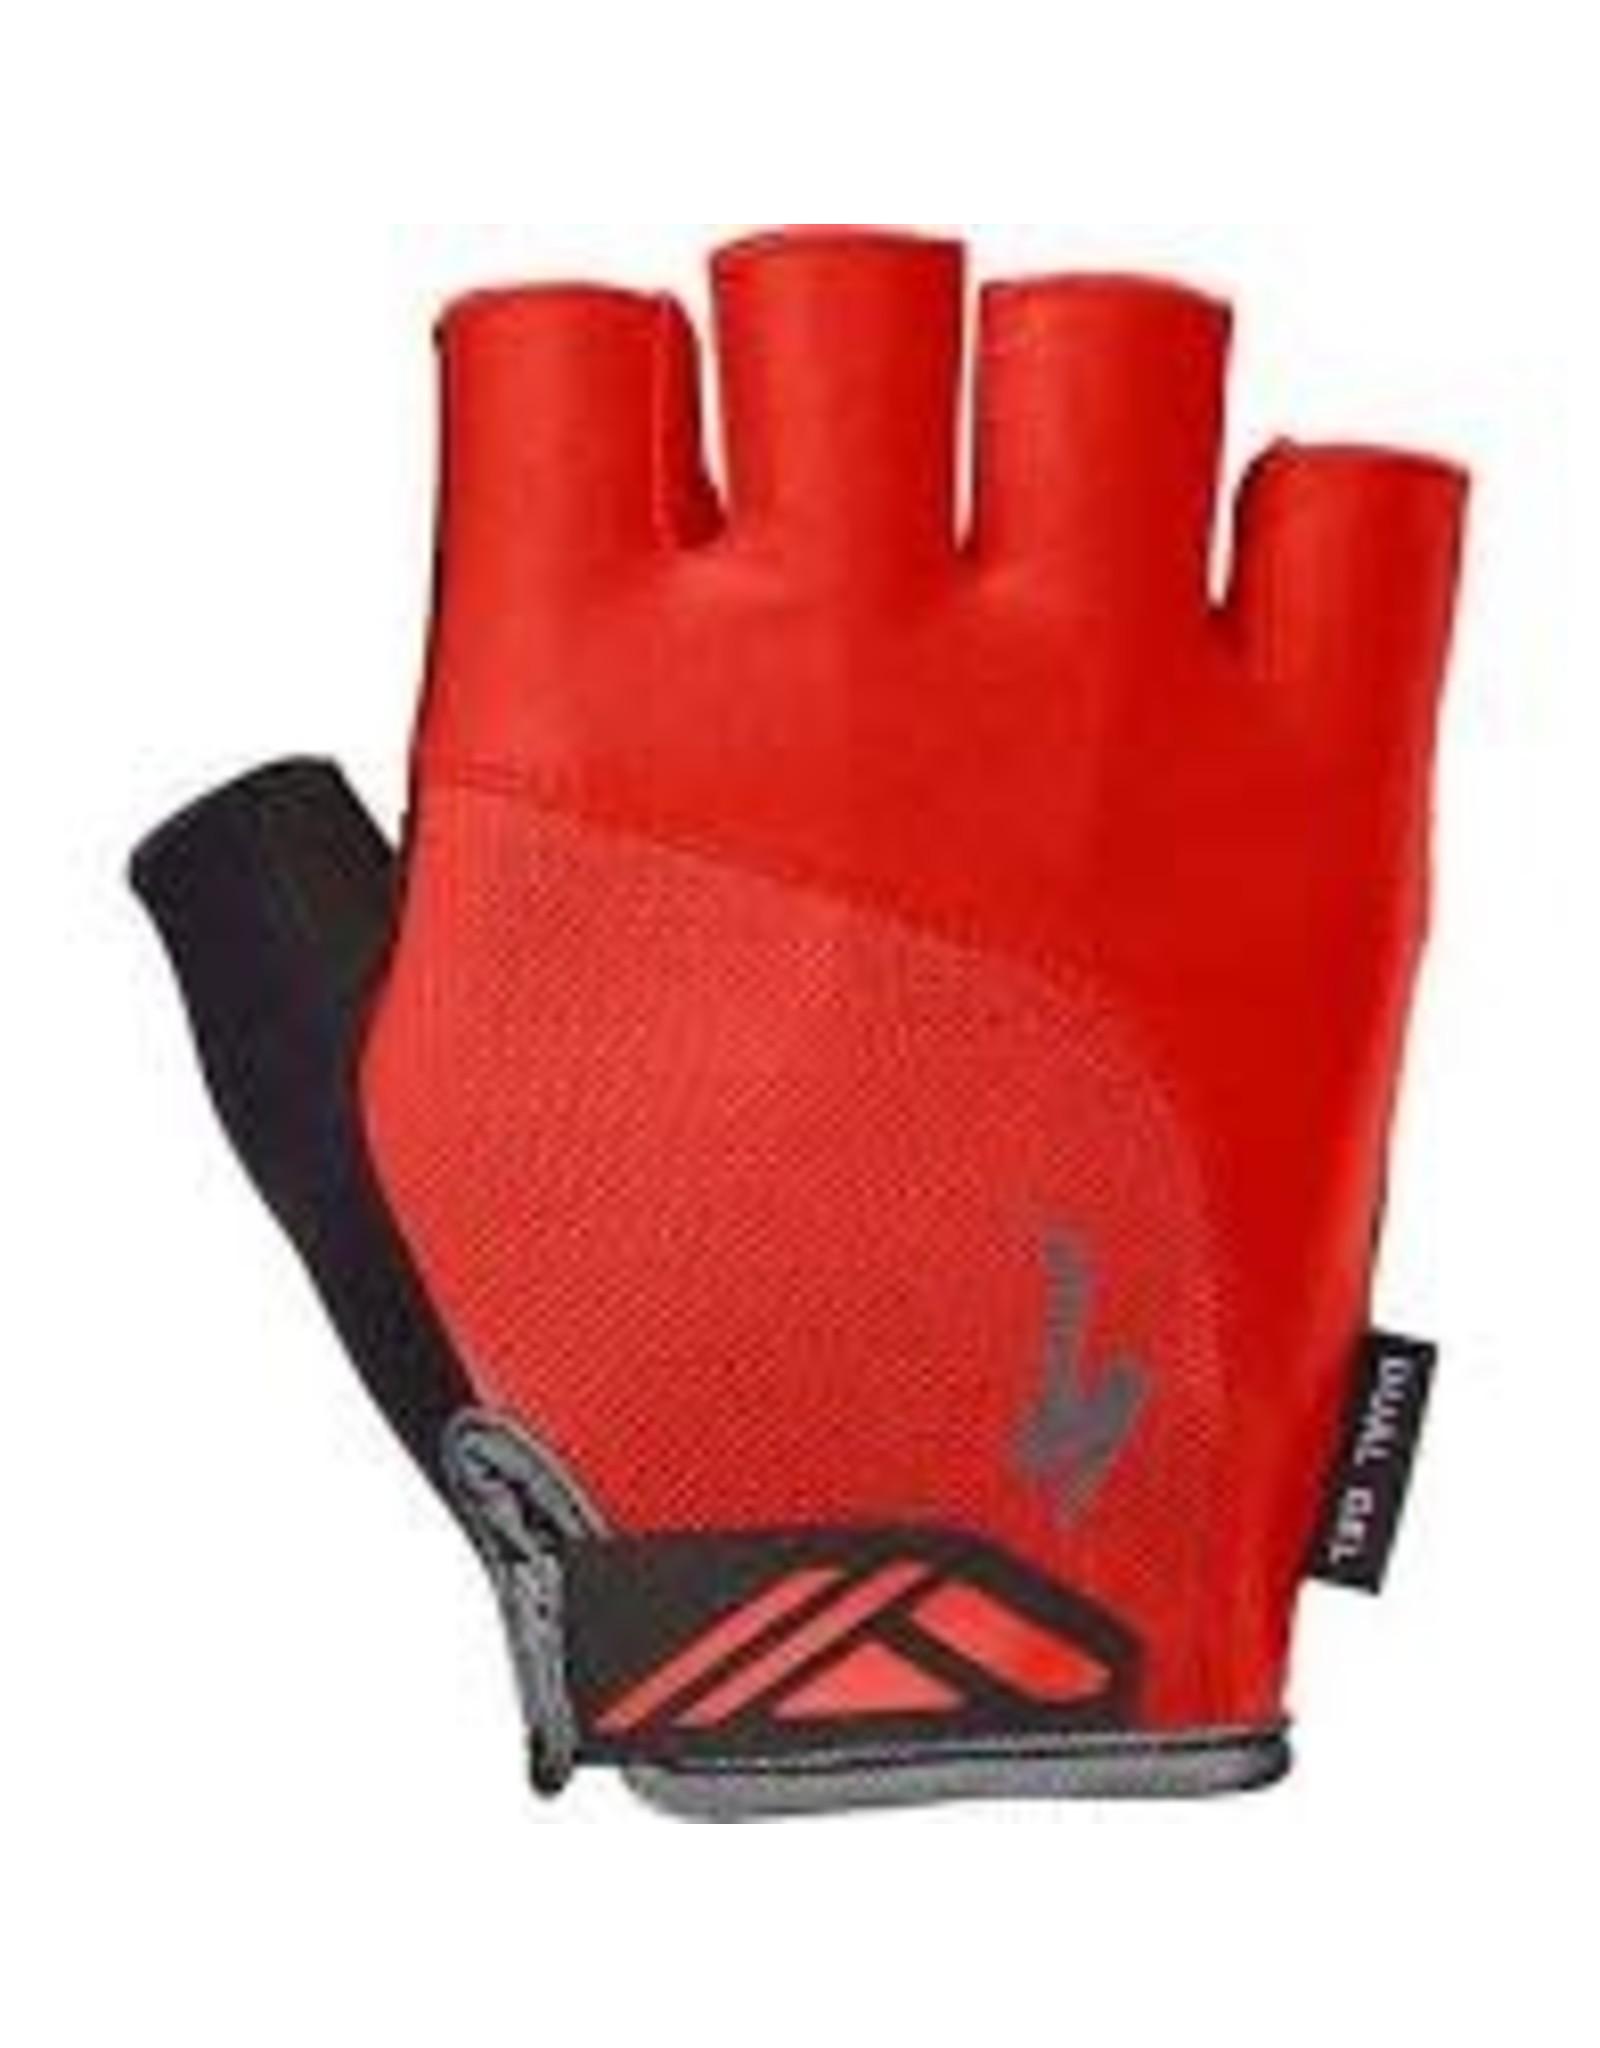 Specialized Glove Spec Dual Gel SF Red XL